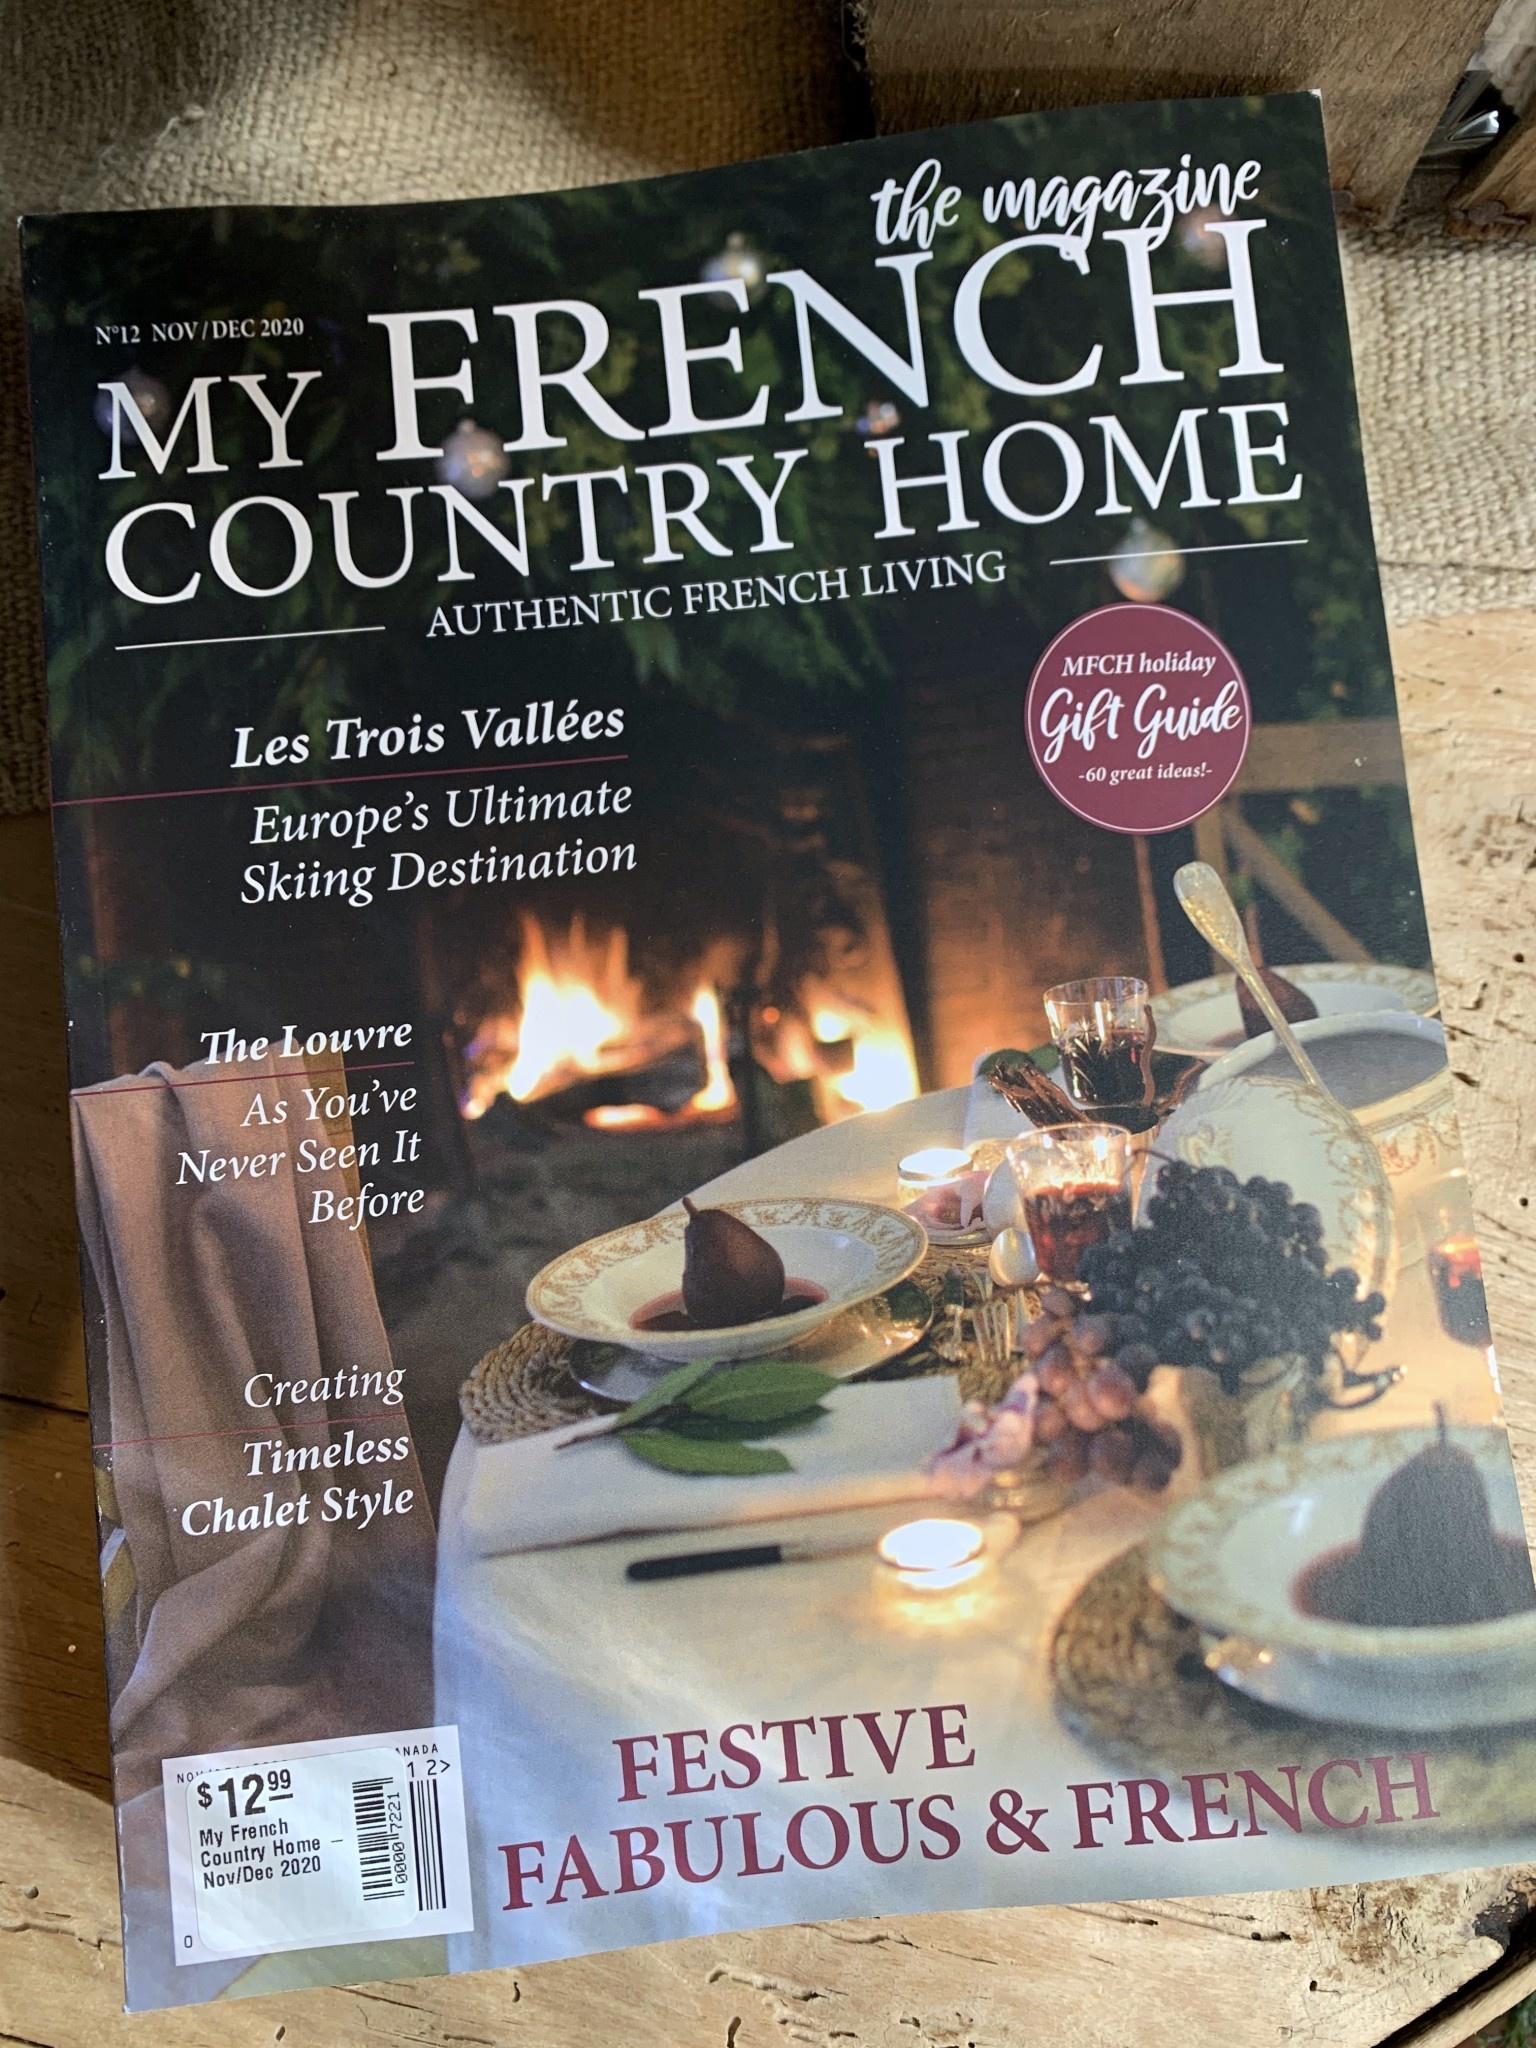 My French Country Home Magazine Nov/Dec 2020